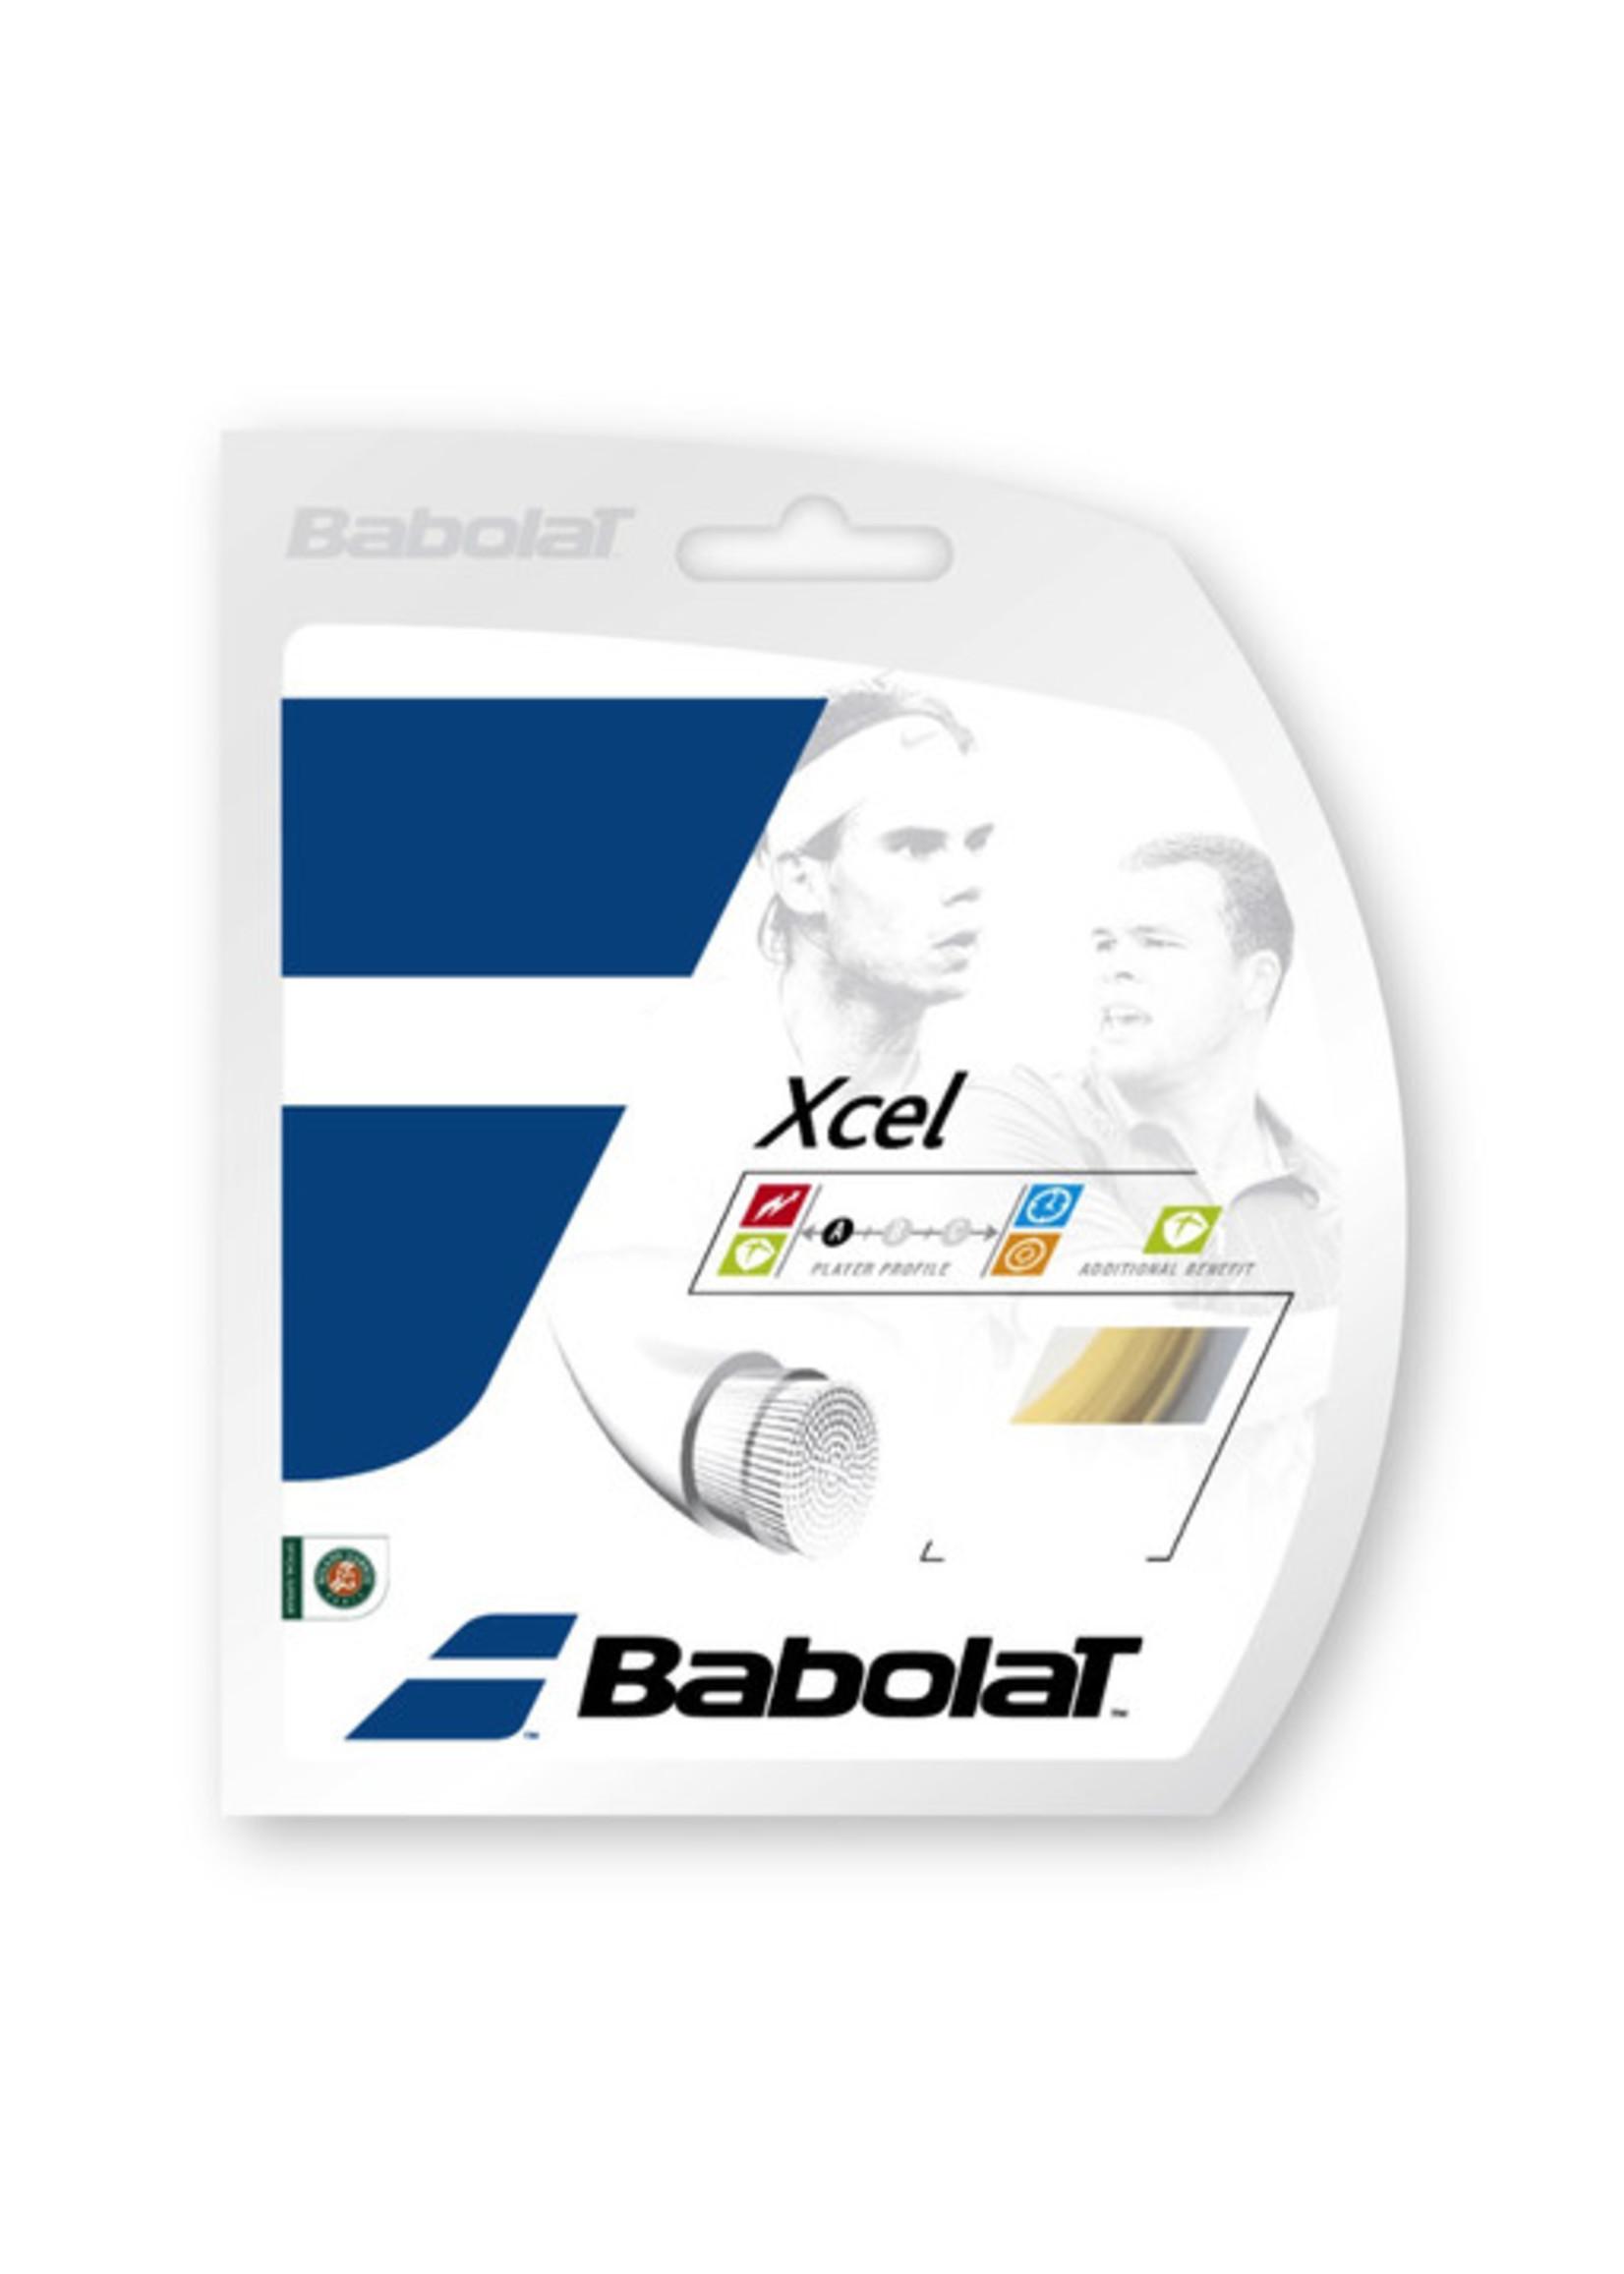 Babolat Pro Hurricane/Xcel Restring